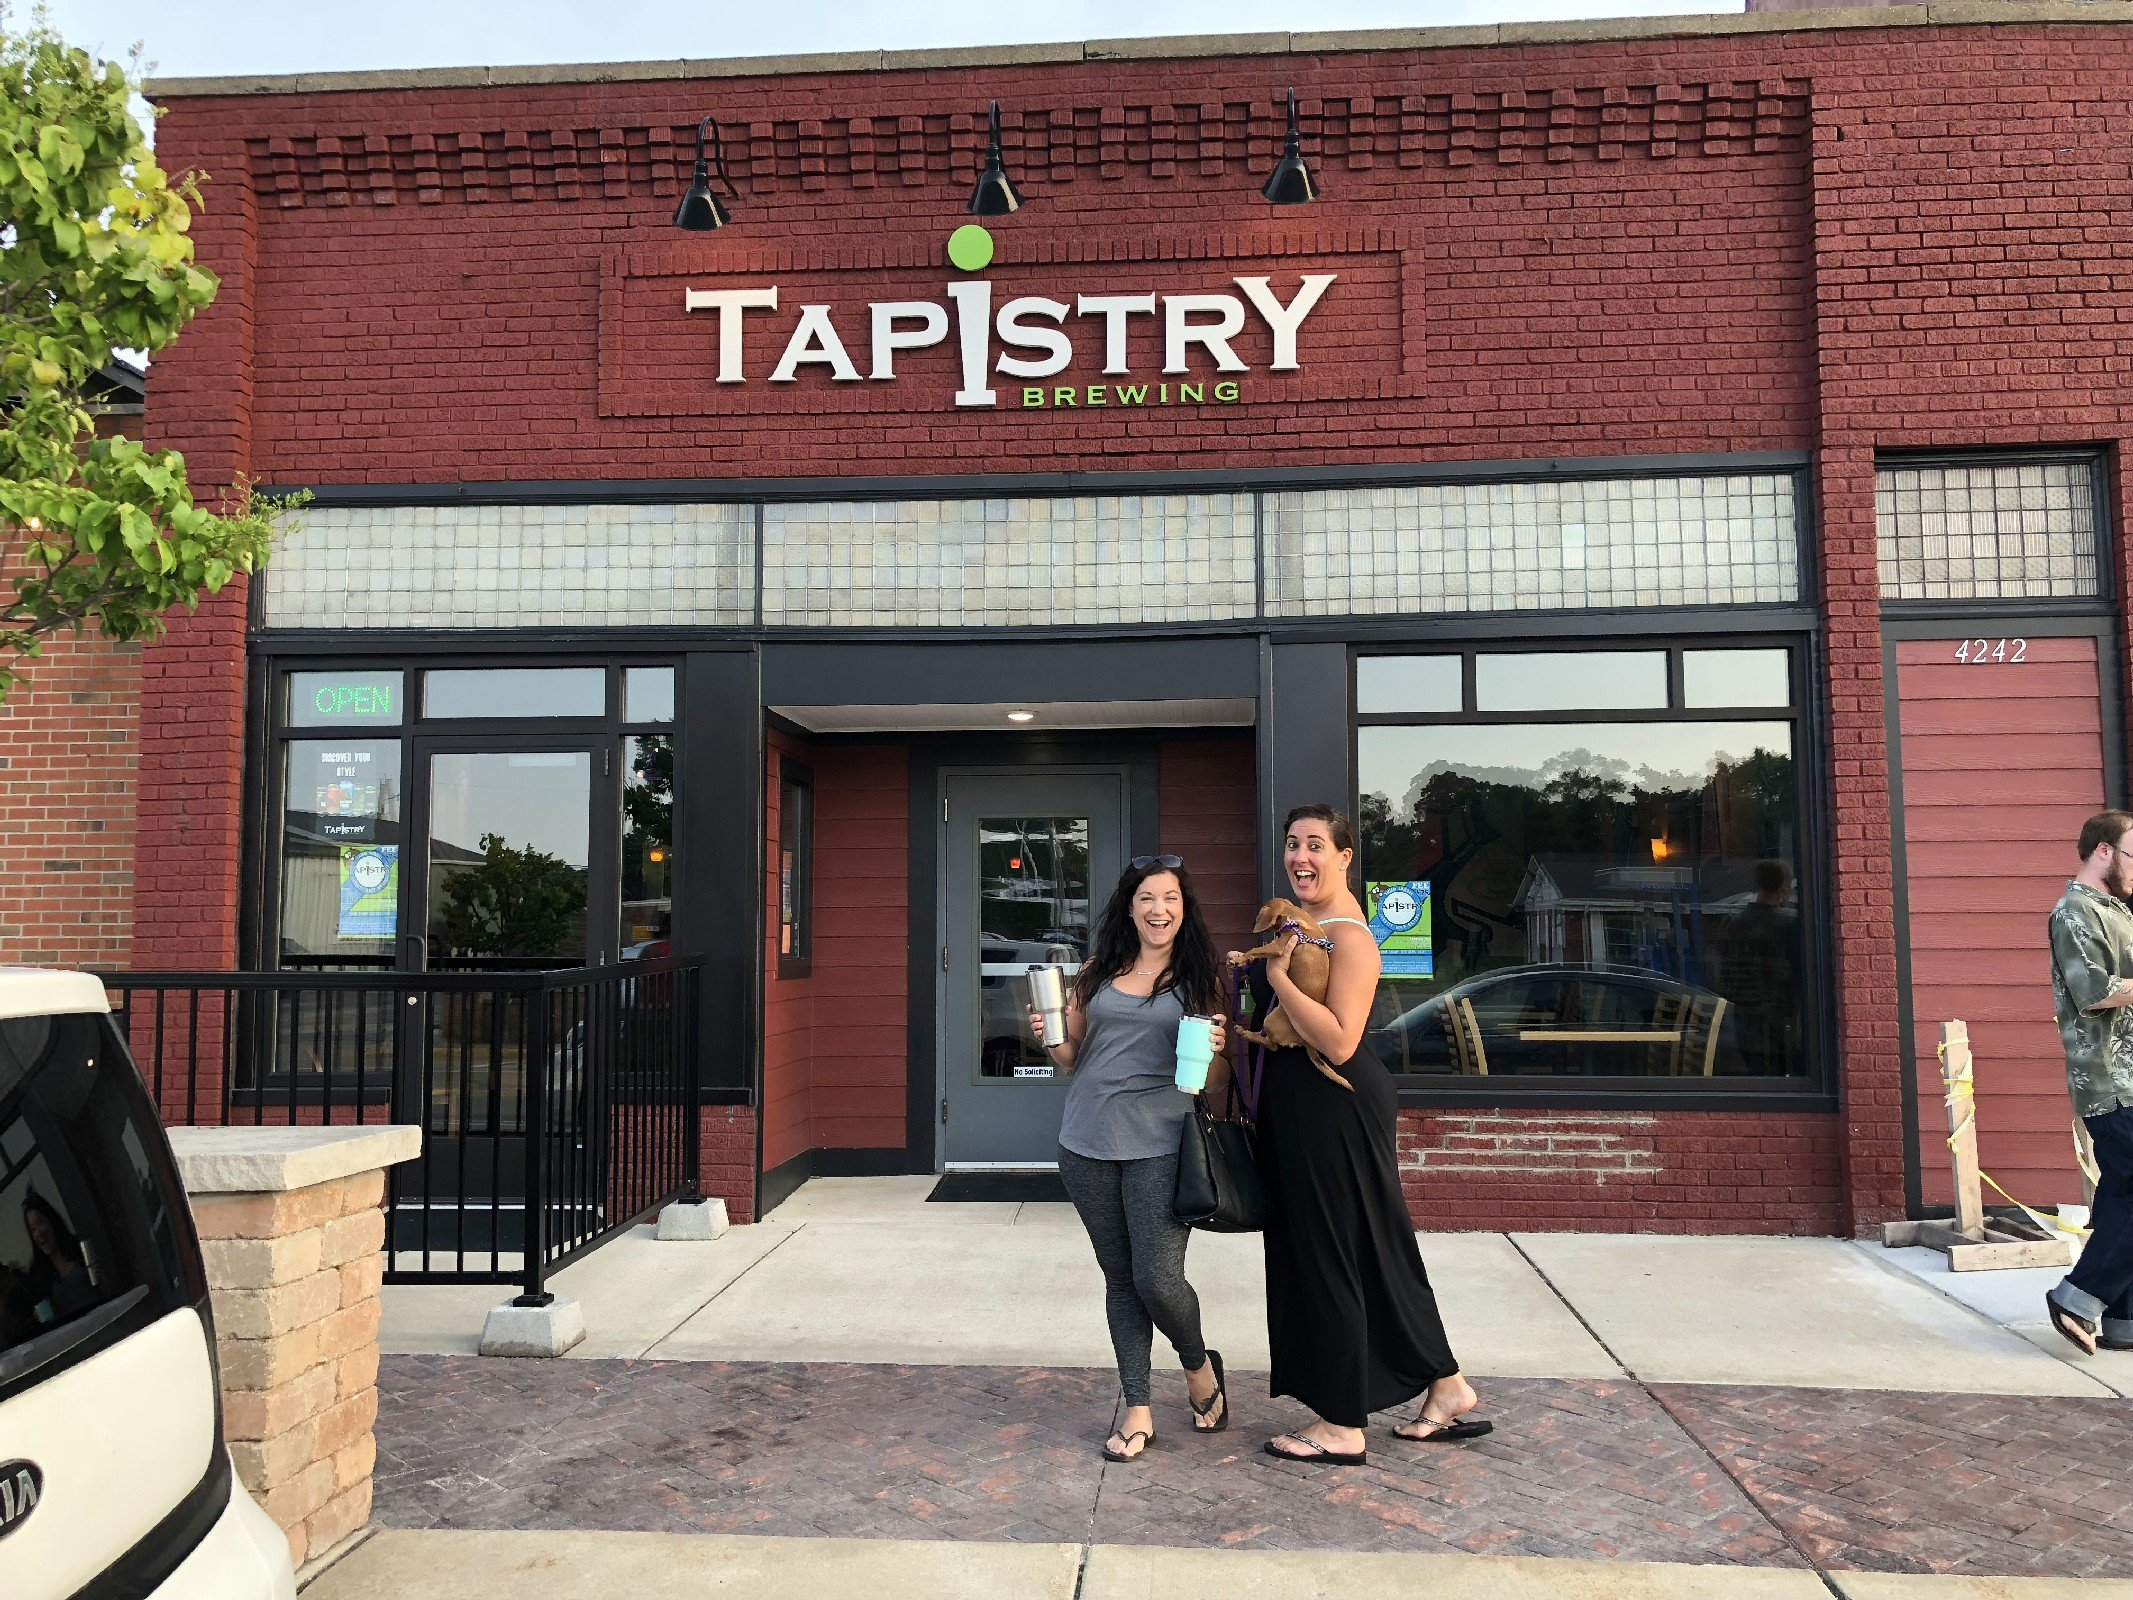 Tapistry Brewing Co. in Bridgman, MI by Jets Like Taxis / Hopsmash